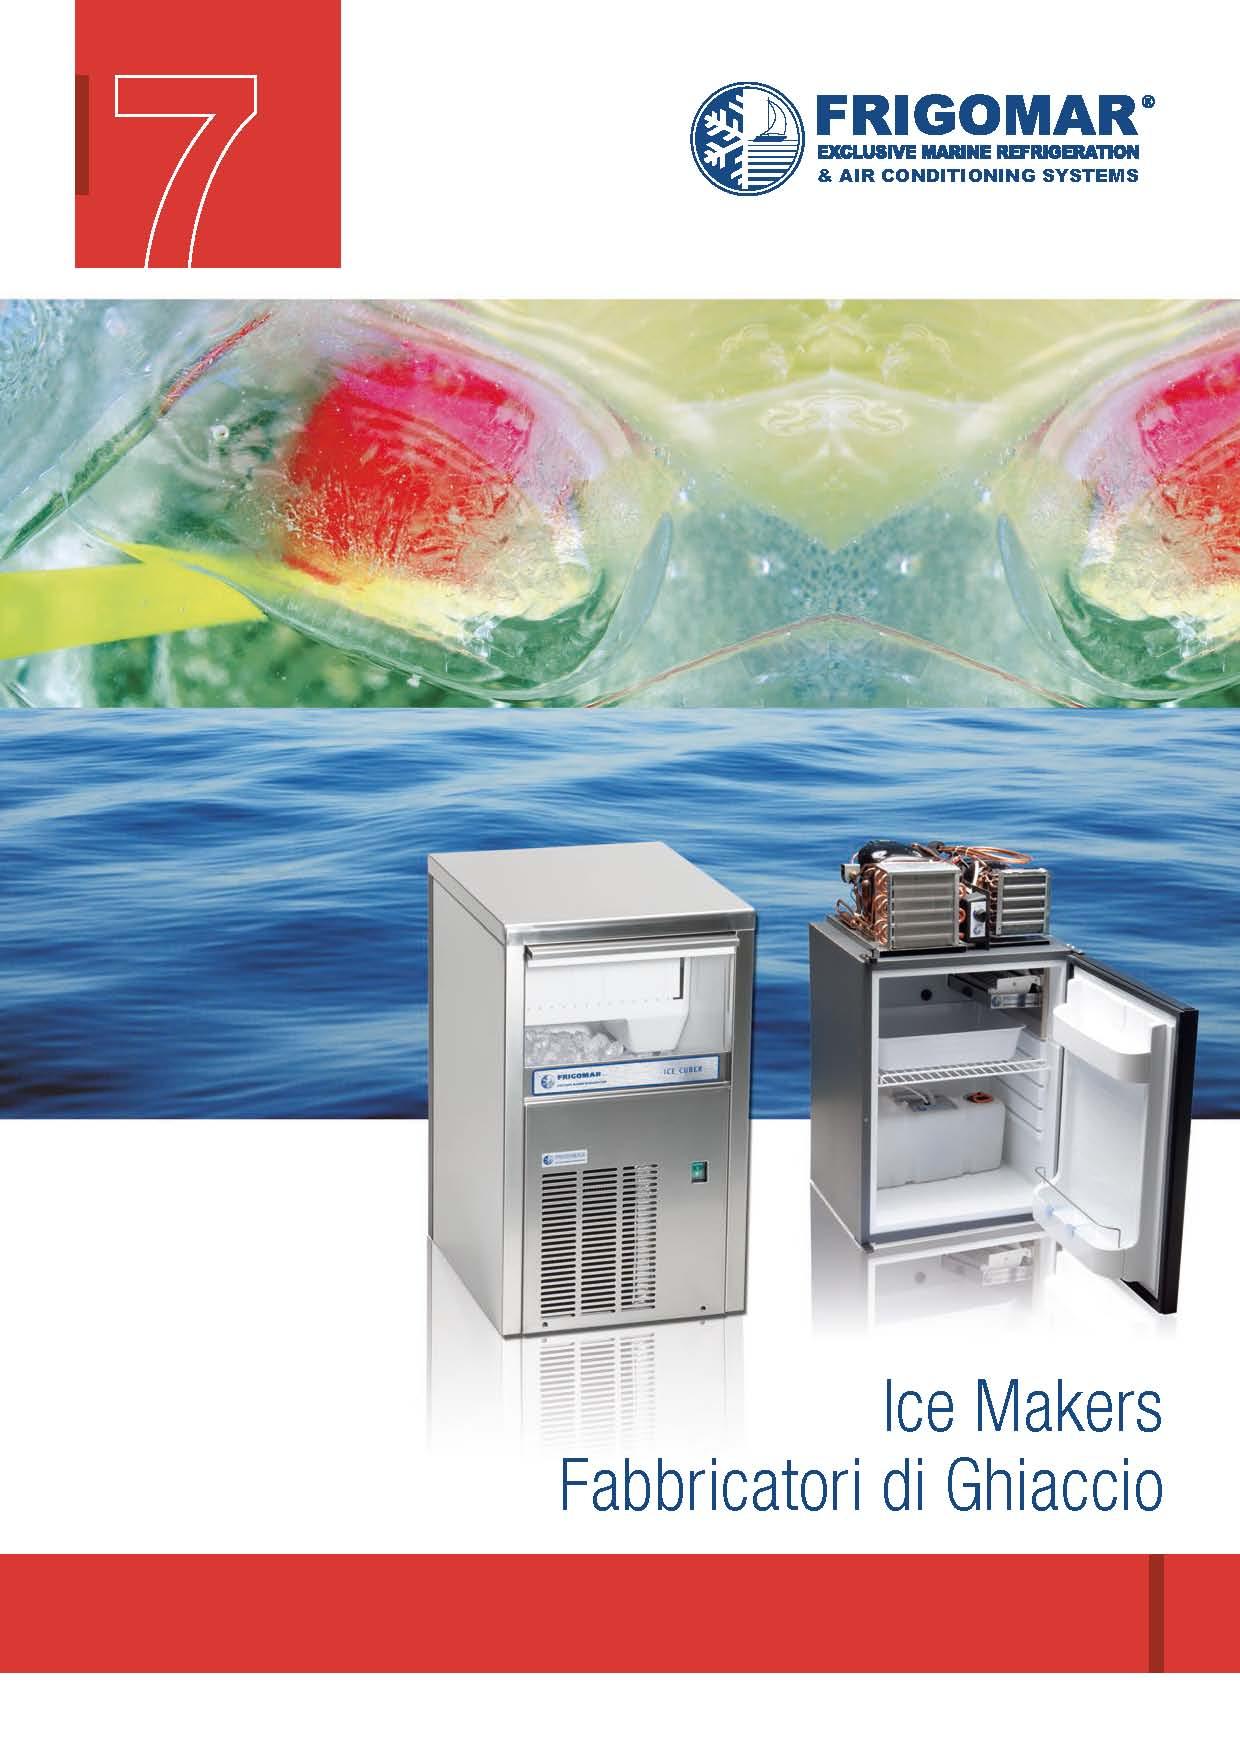 frigorifero Ice Maker acqua hook up